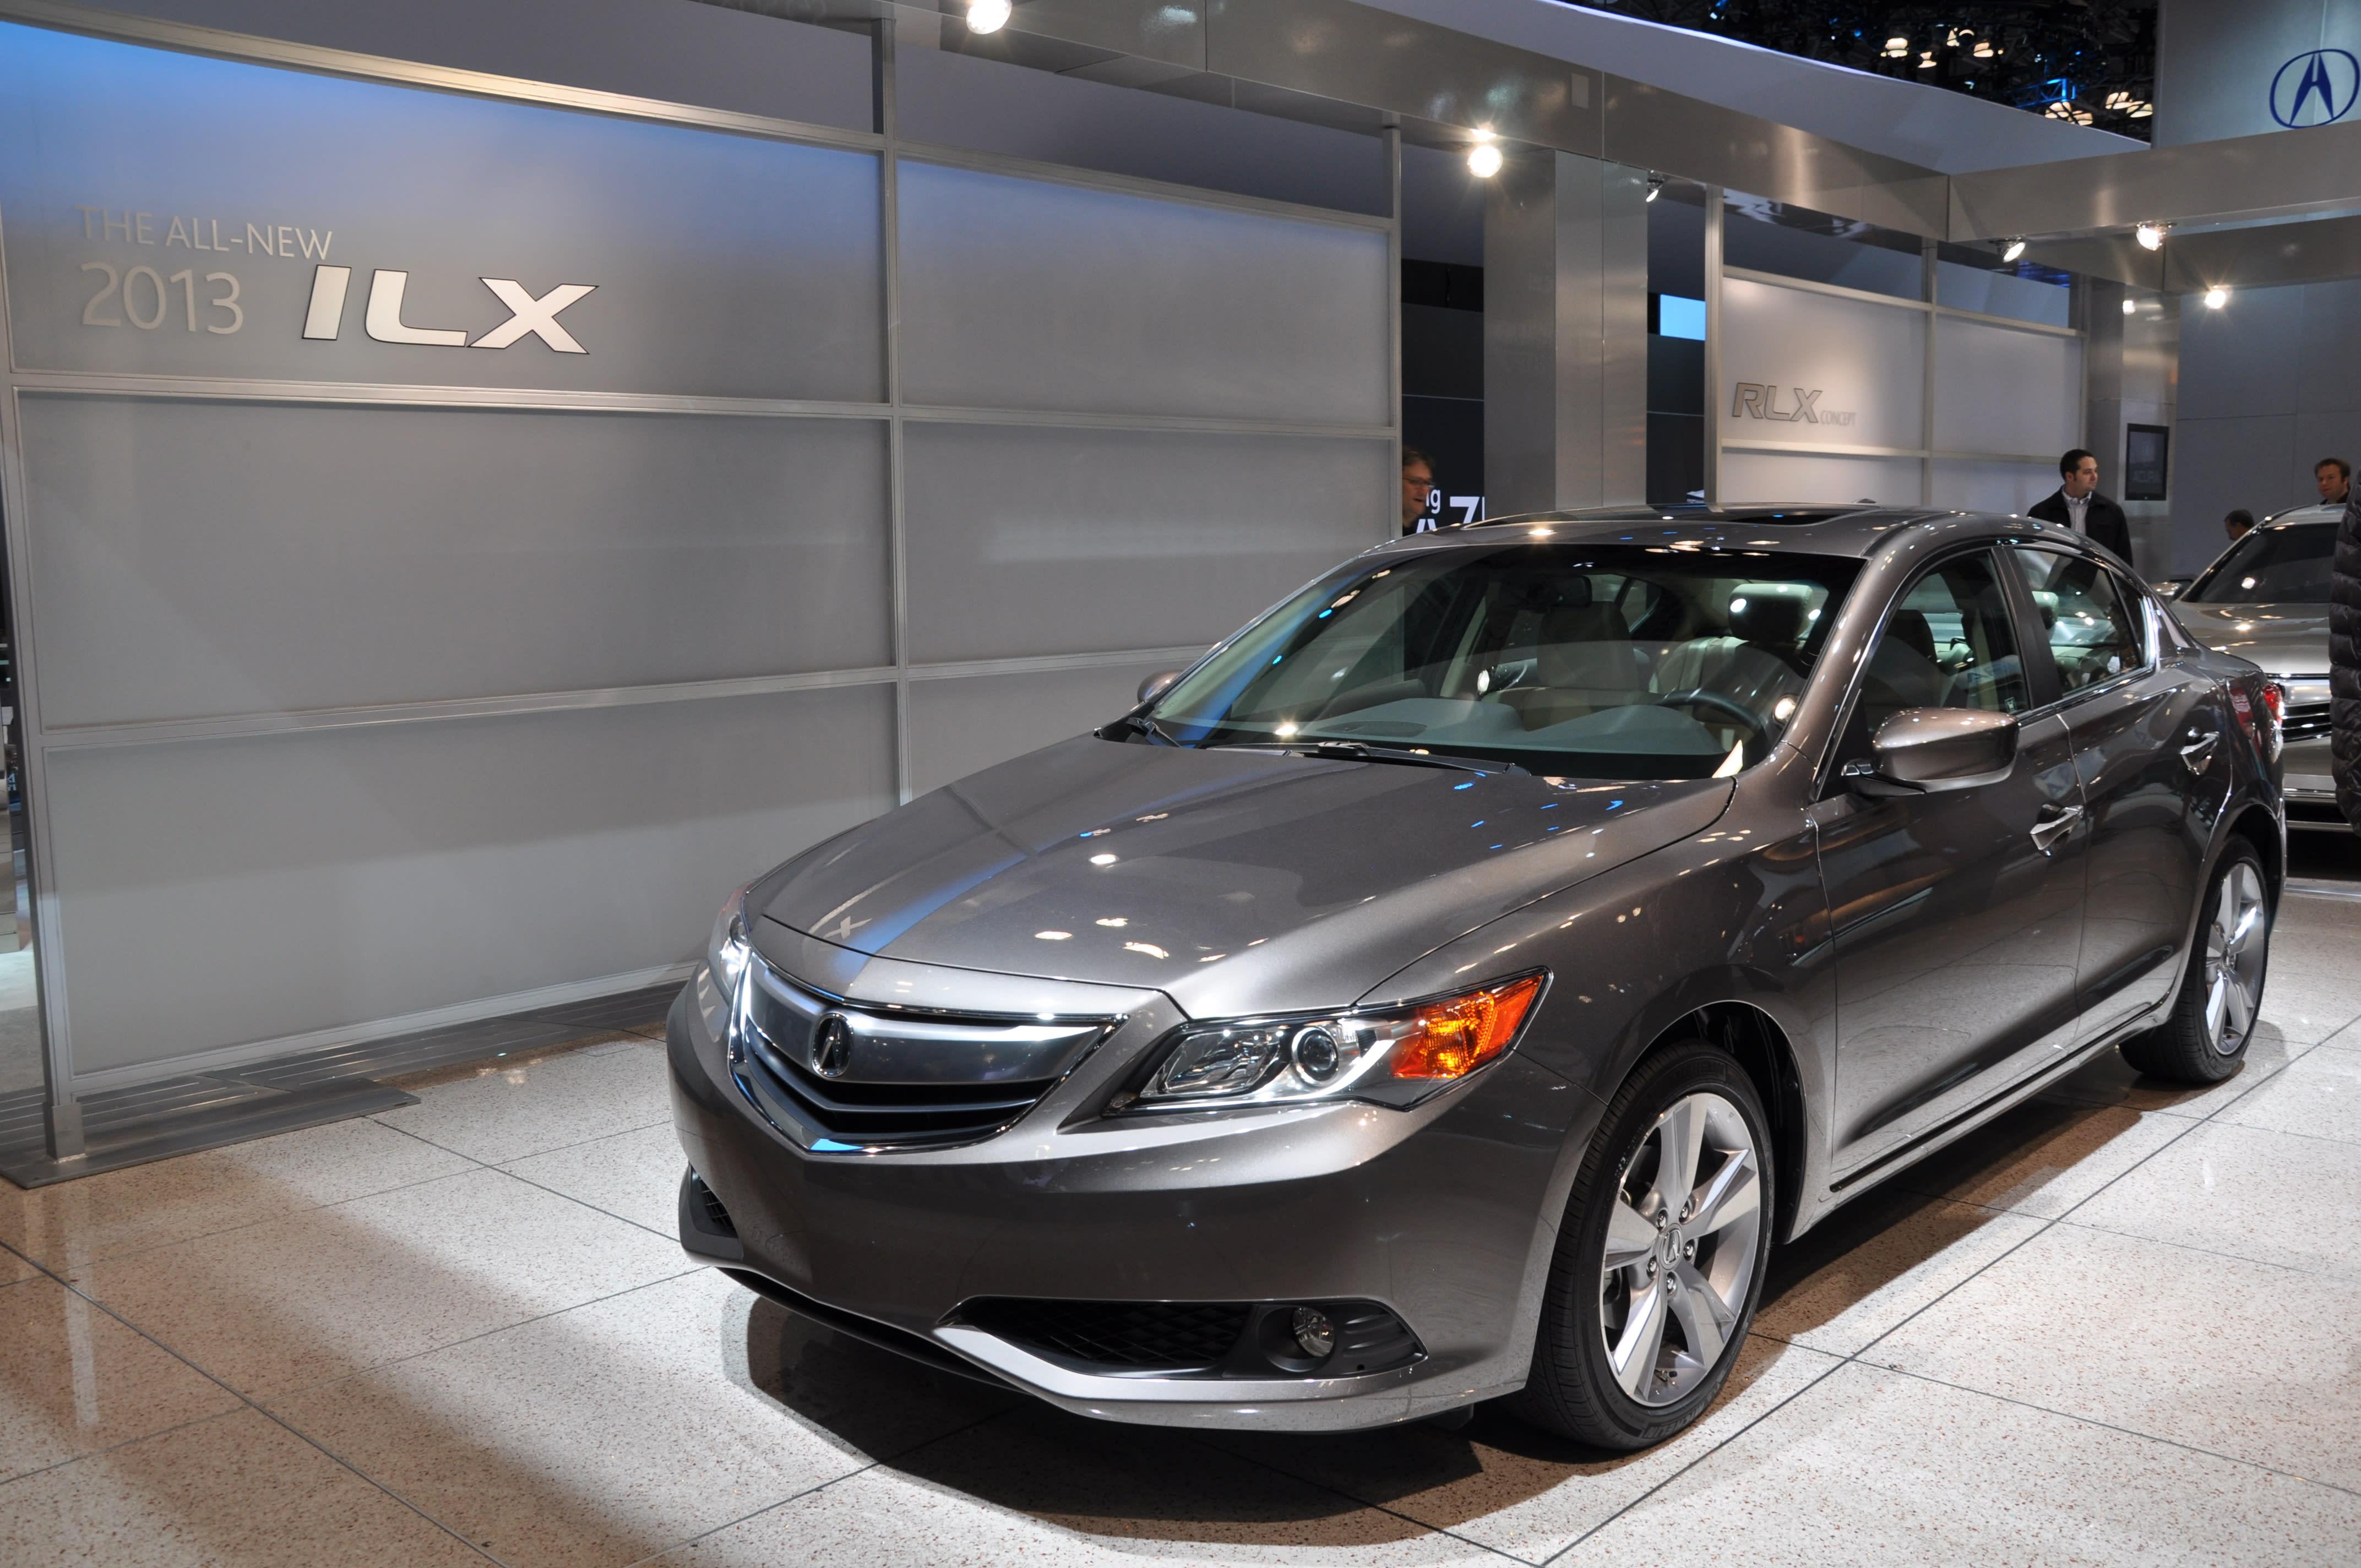 Honda Recalls 4,455 Acura ILX Vehicles